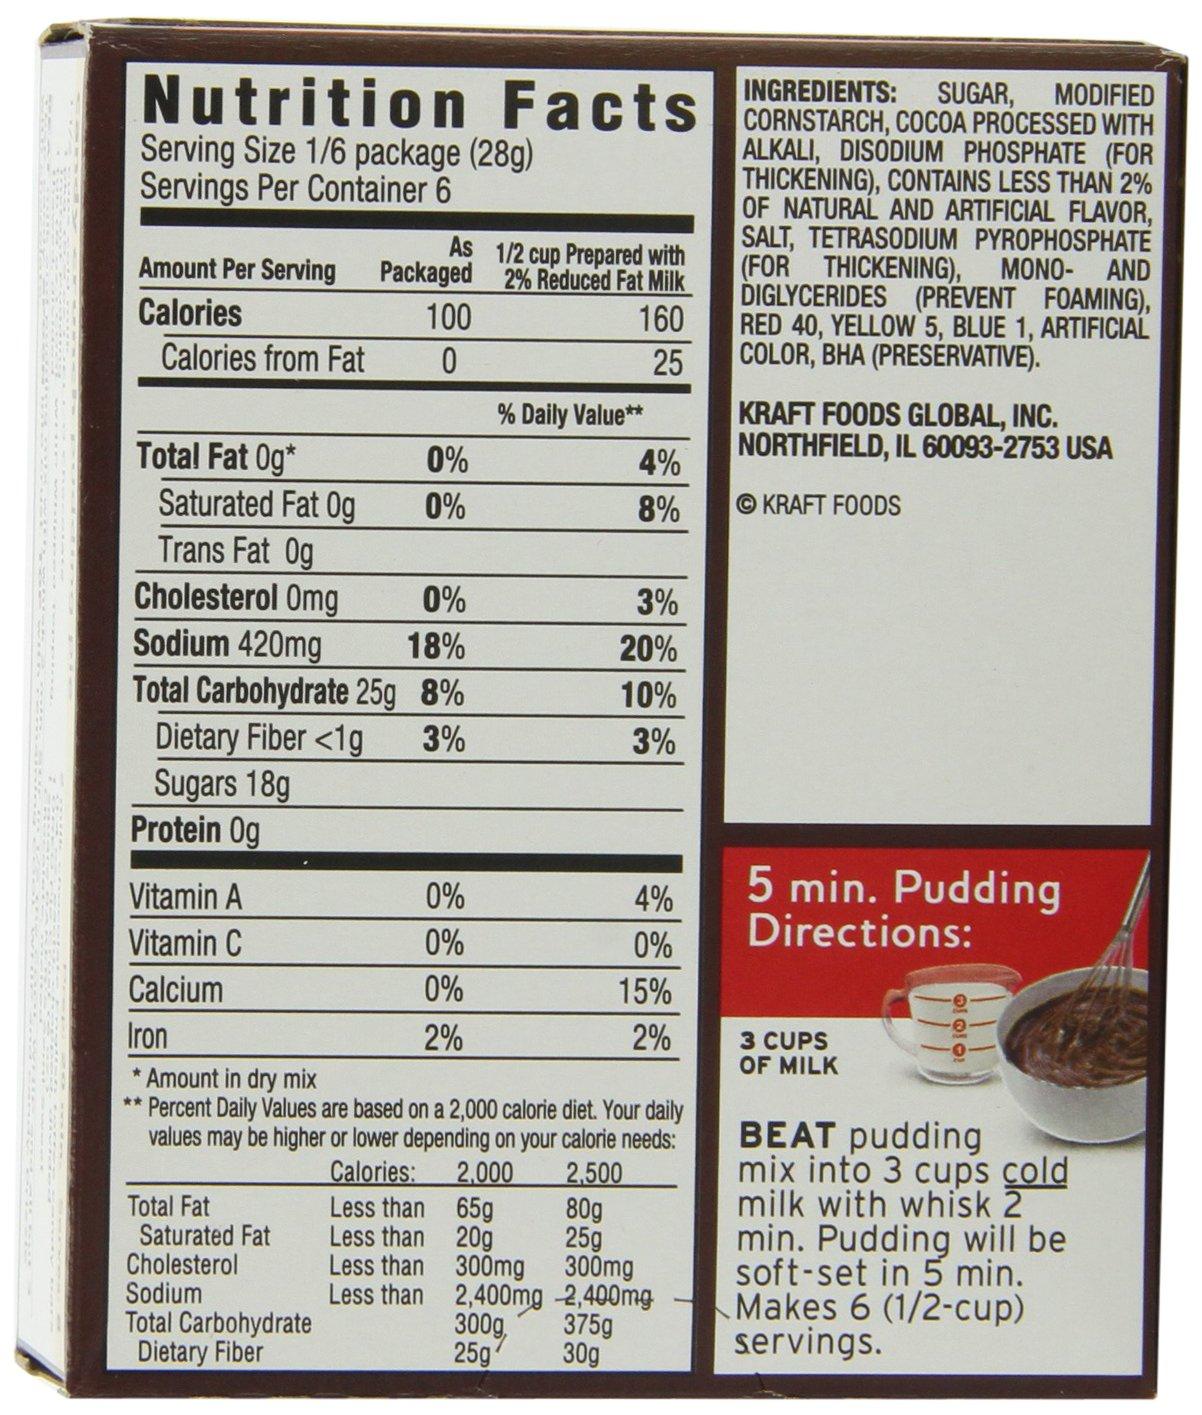 jello instant pudding directions 5.1 oz